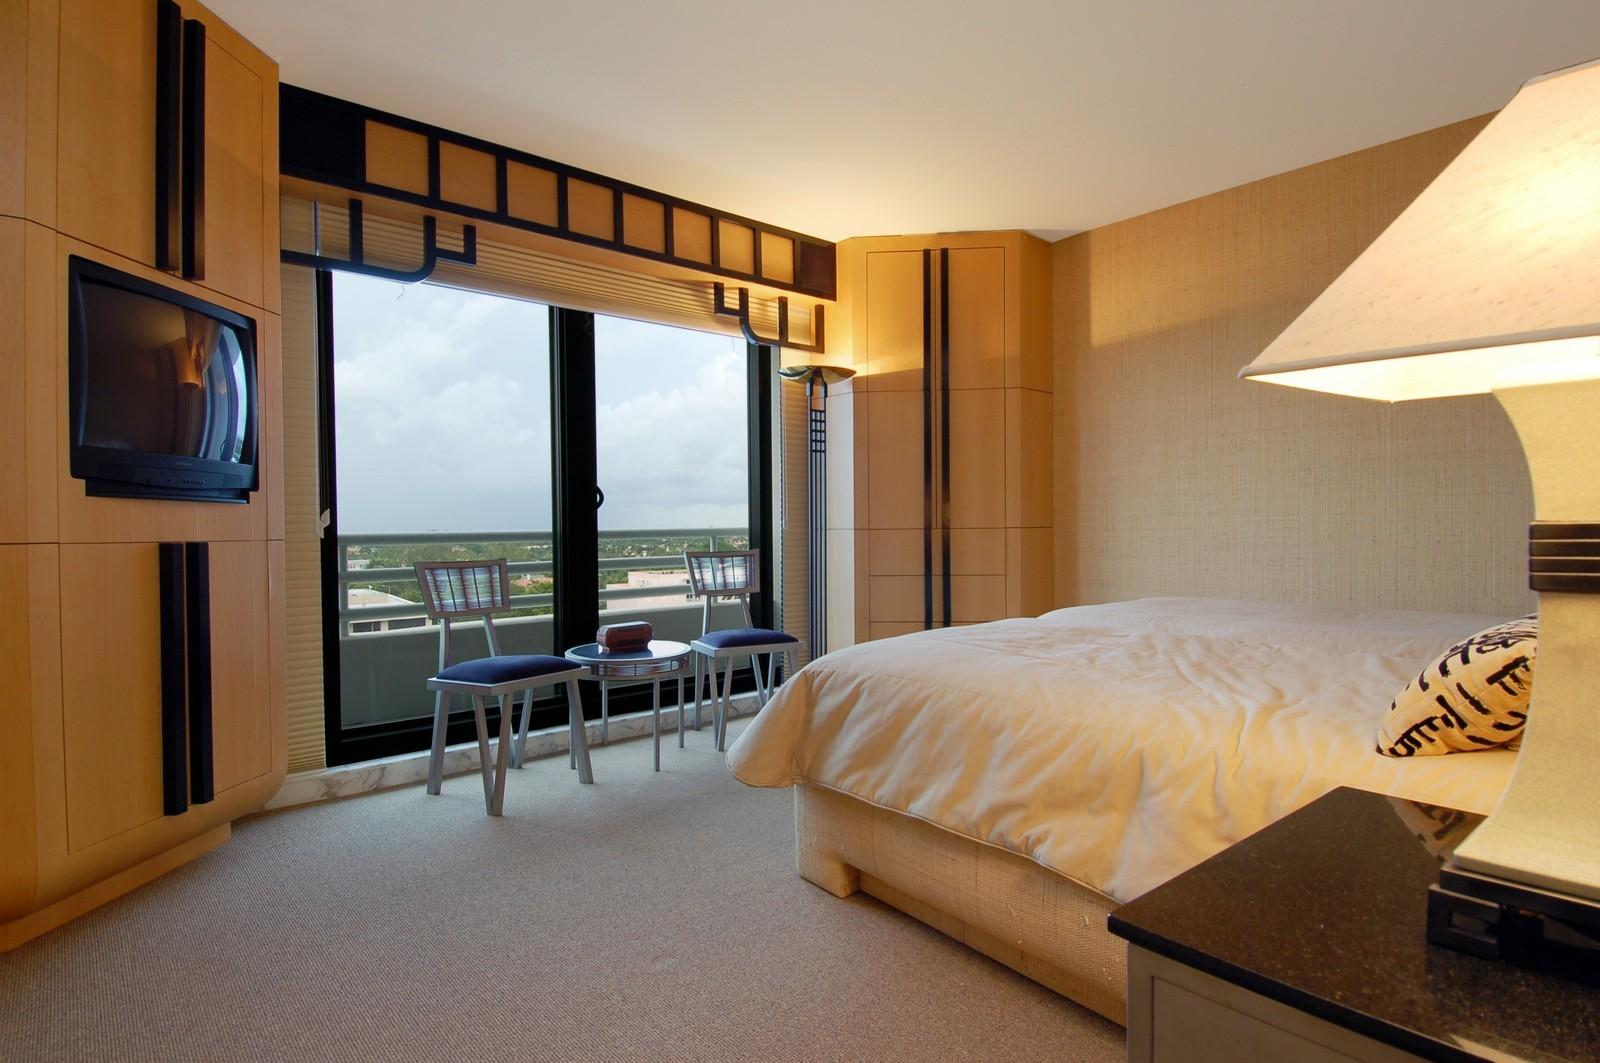 Real Estate Photography - 1500 S Ocean Blvd, Unit S903/4, Boca Raton, FL, 33432 - Bedroom